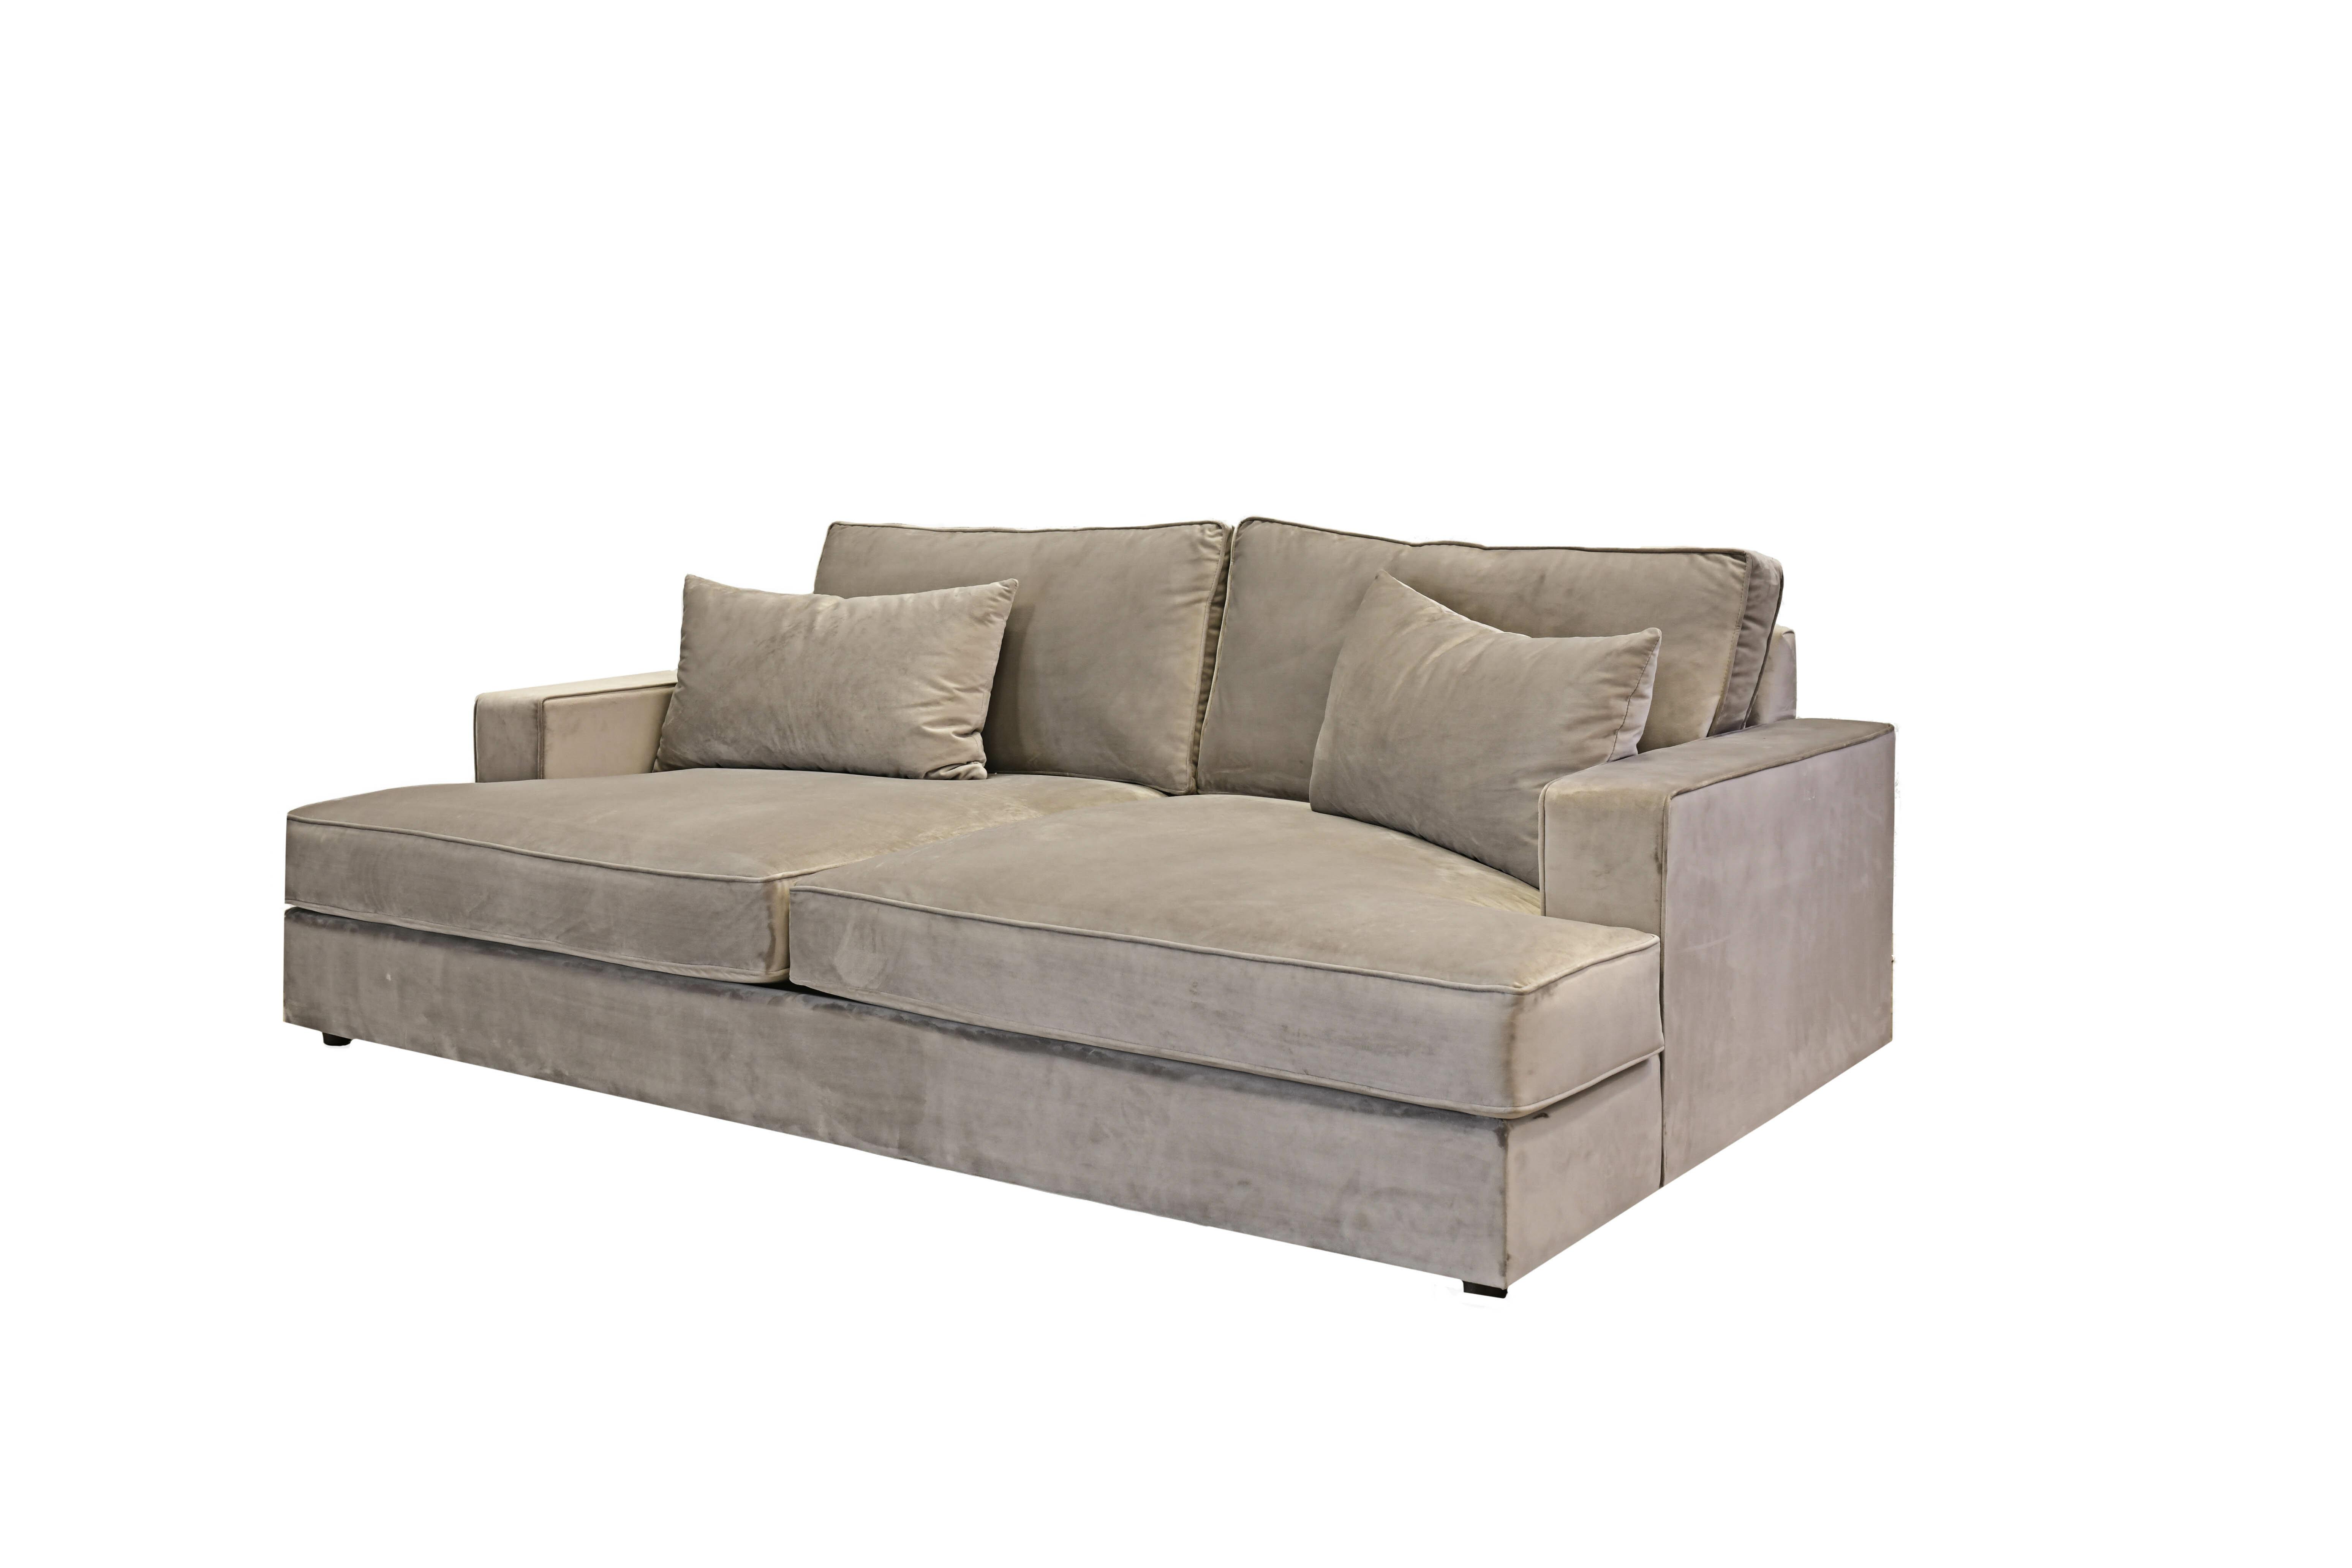 Tremendous Bailey Sofa Dailytribune Chair Design For Home Dailytribuneorg